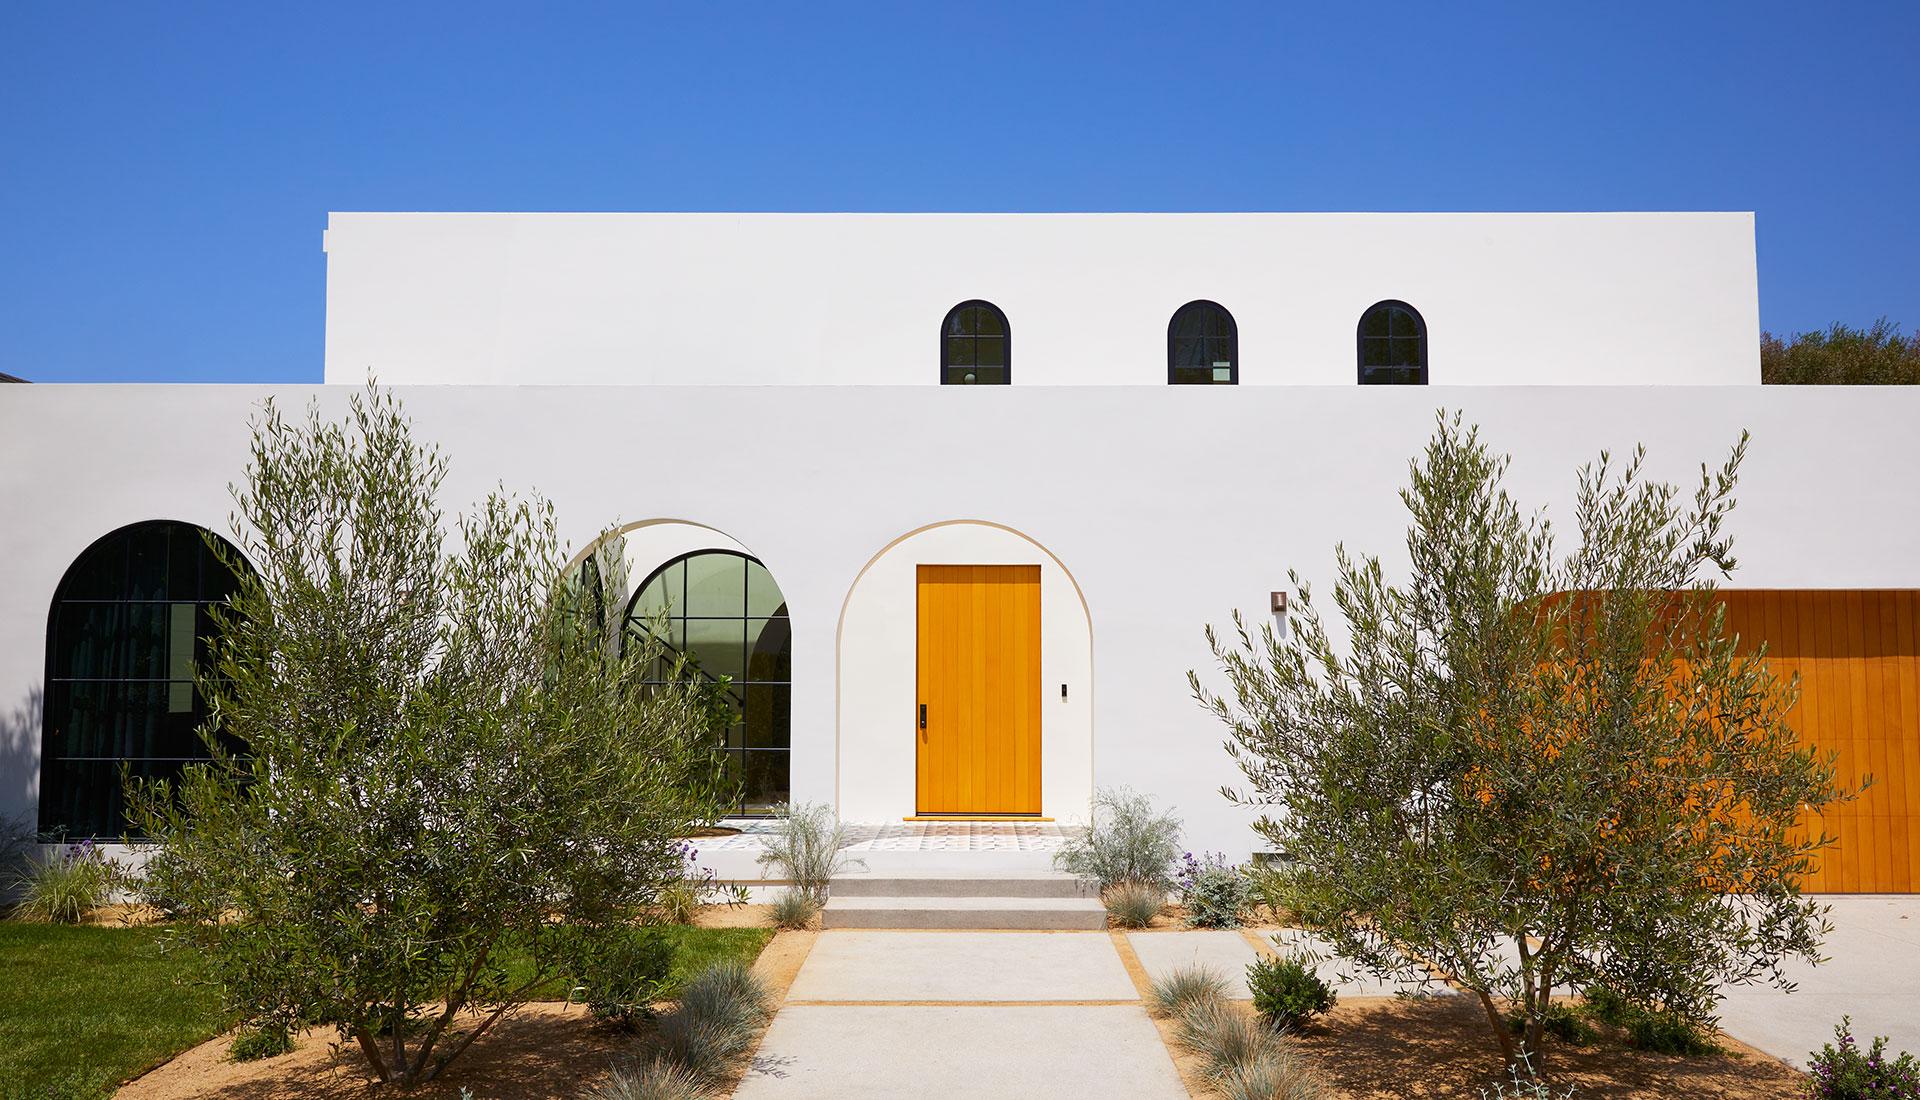 And And And Studio: калифорнийский модернизм в Лос-Анджелесе